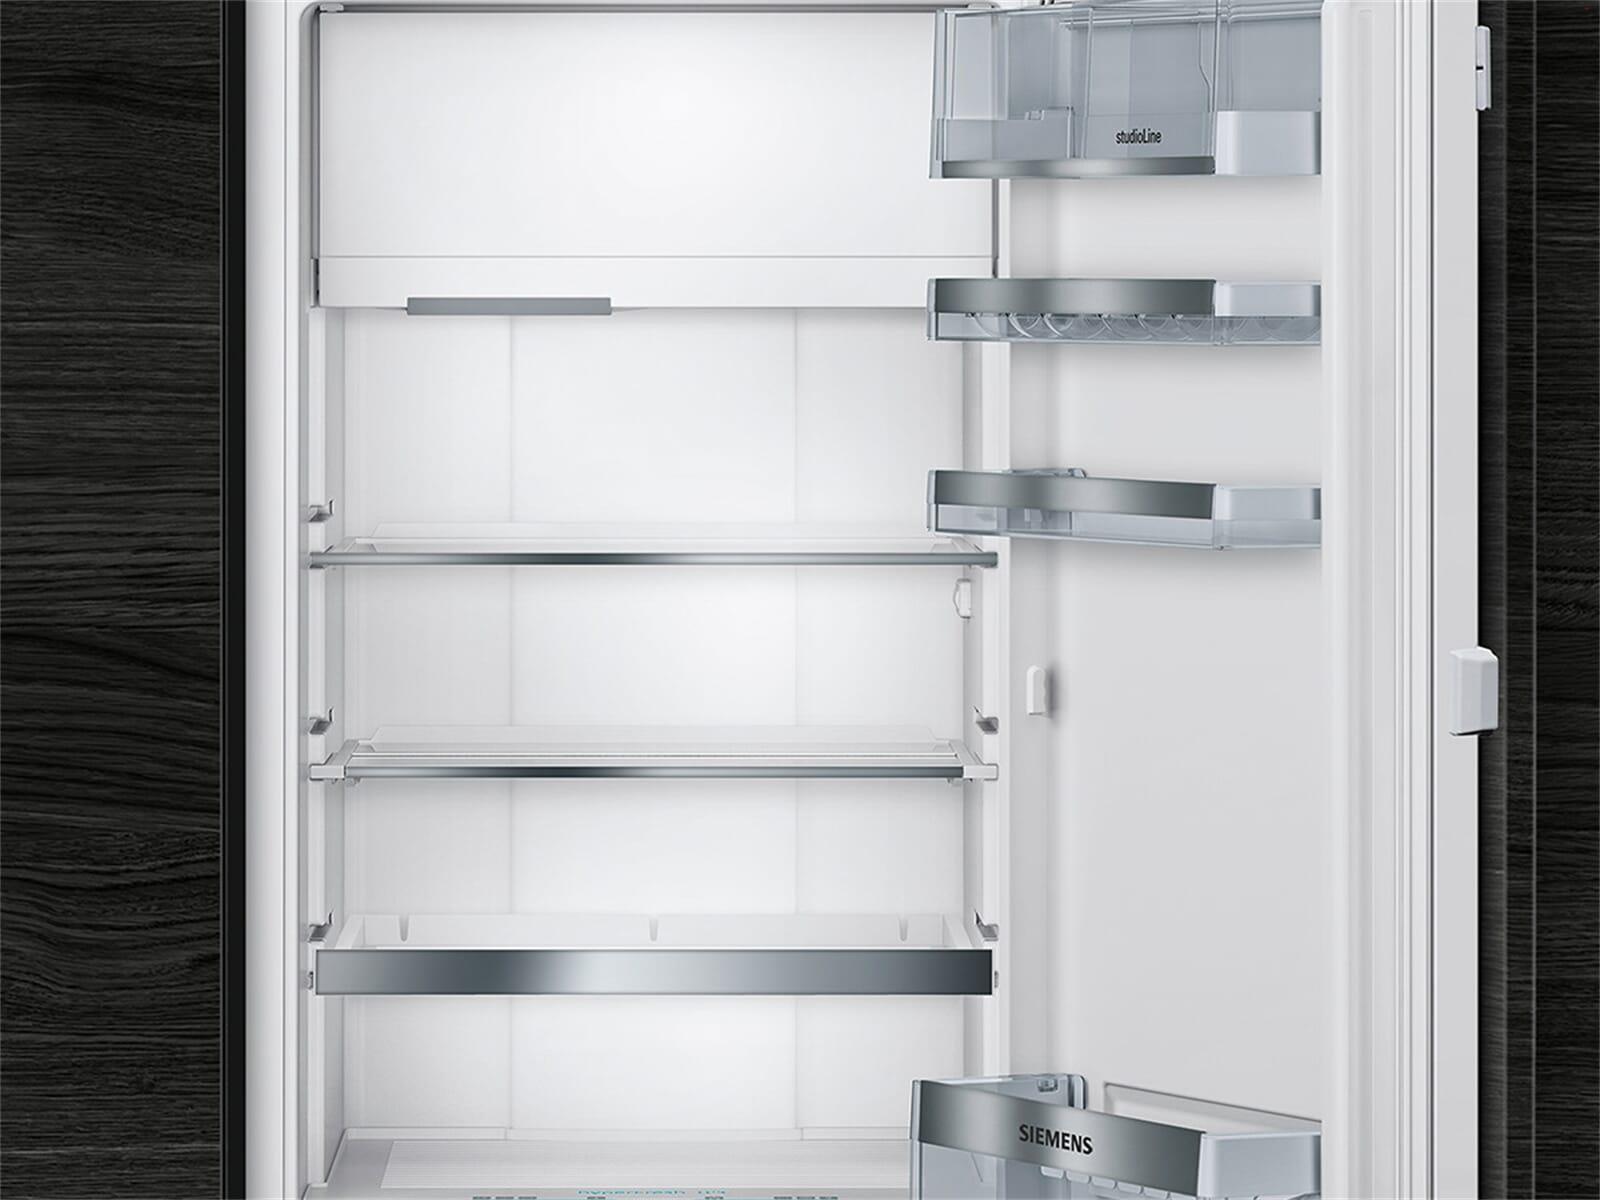 Siemens Studioline Kühlschrank : Siemens studioline ki fsd einbaukühlschrank